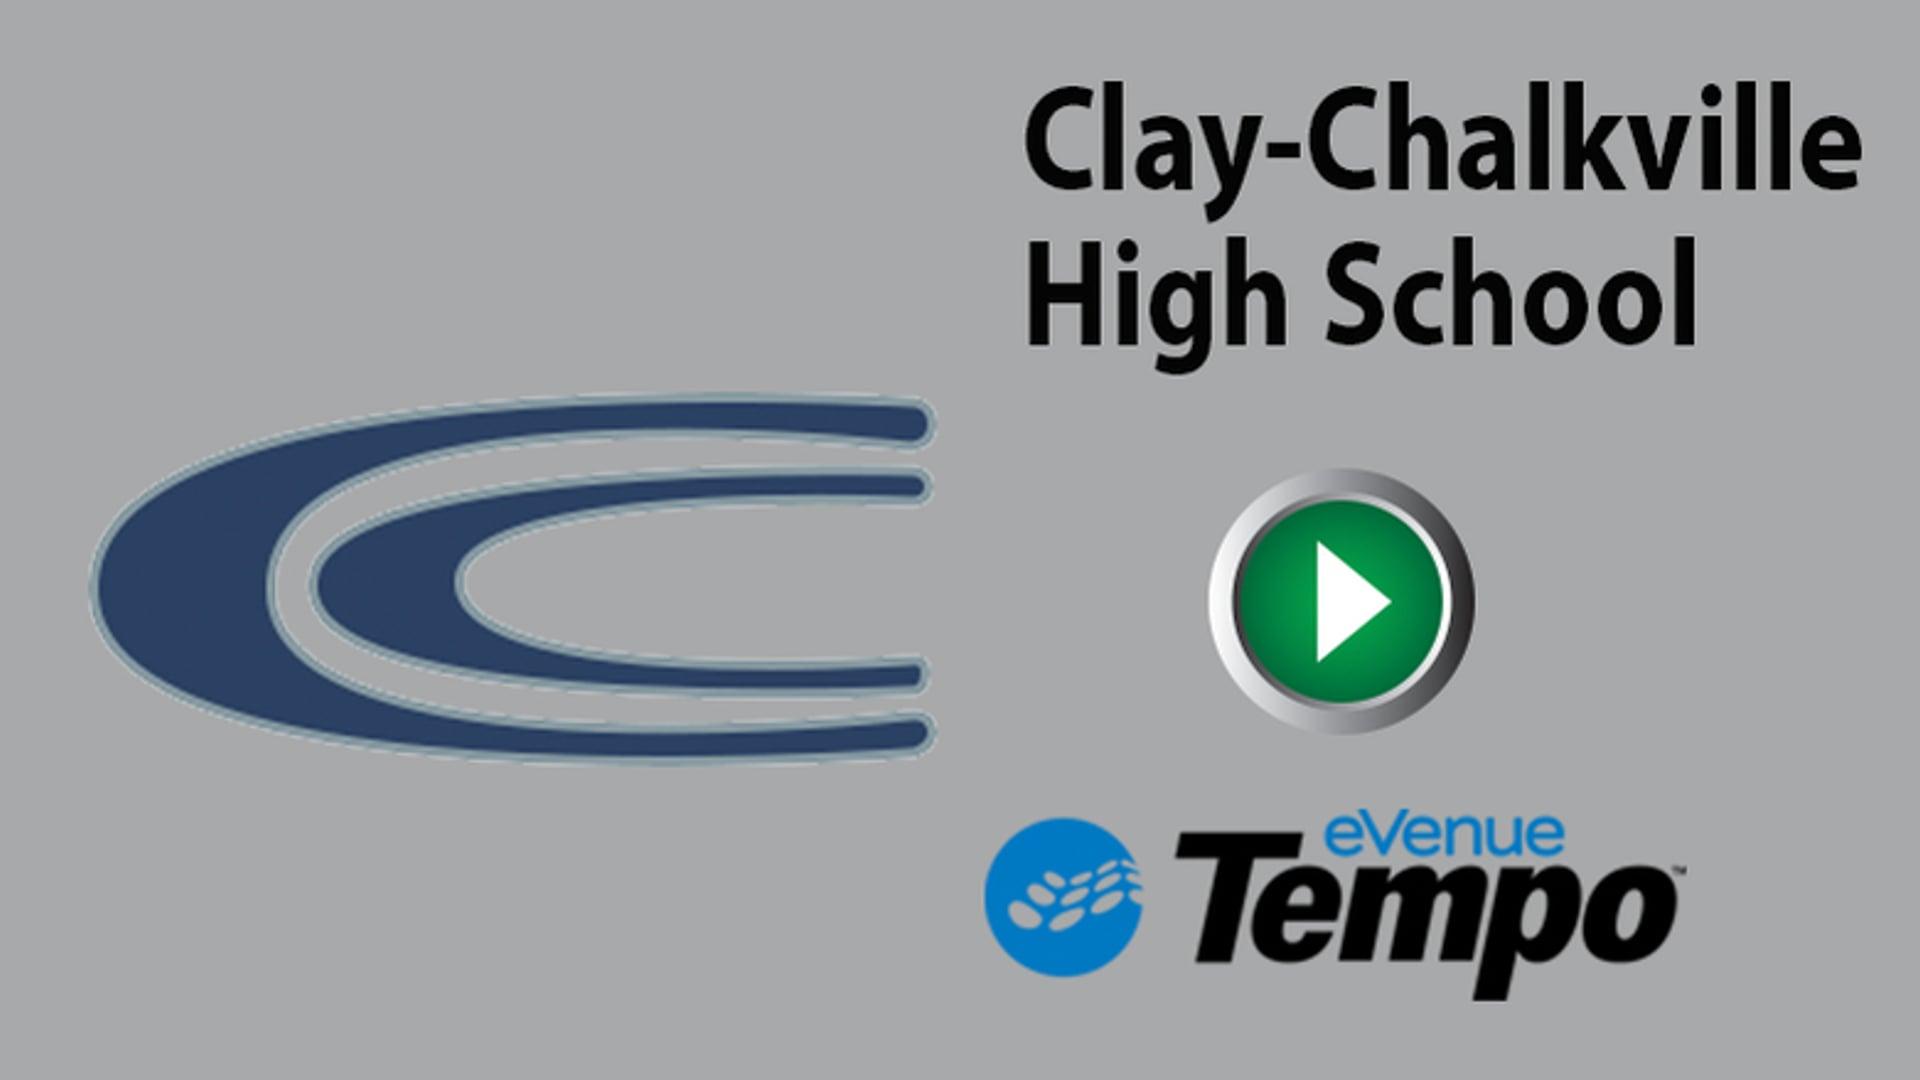 Clay Chalkville High School - eVenue Tempo